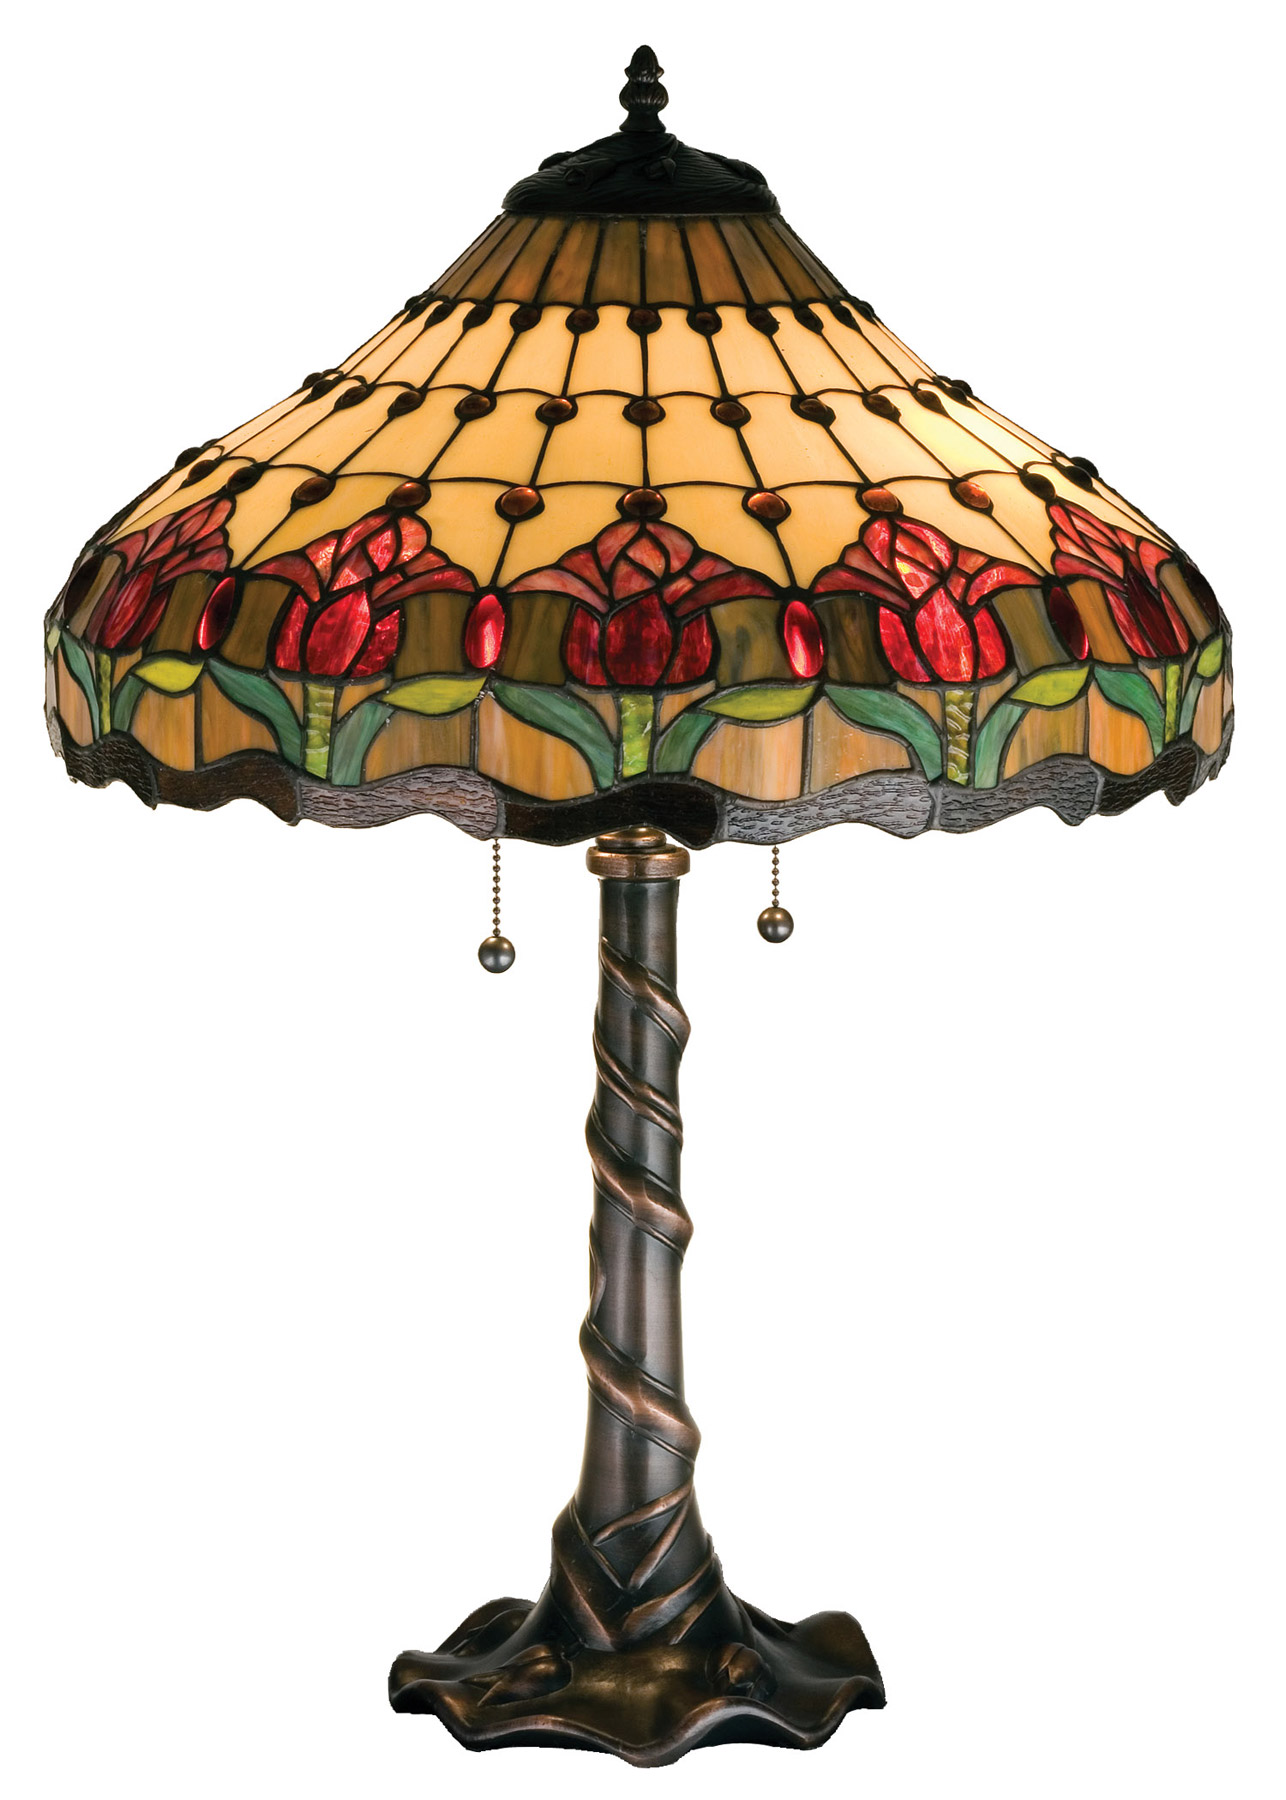 Meyda 99270 Tiffany Tulip Table Lamp